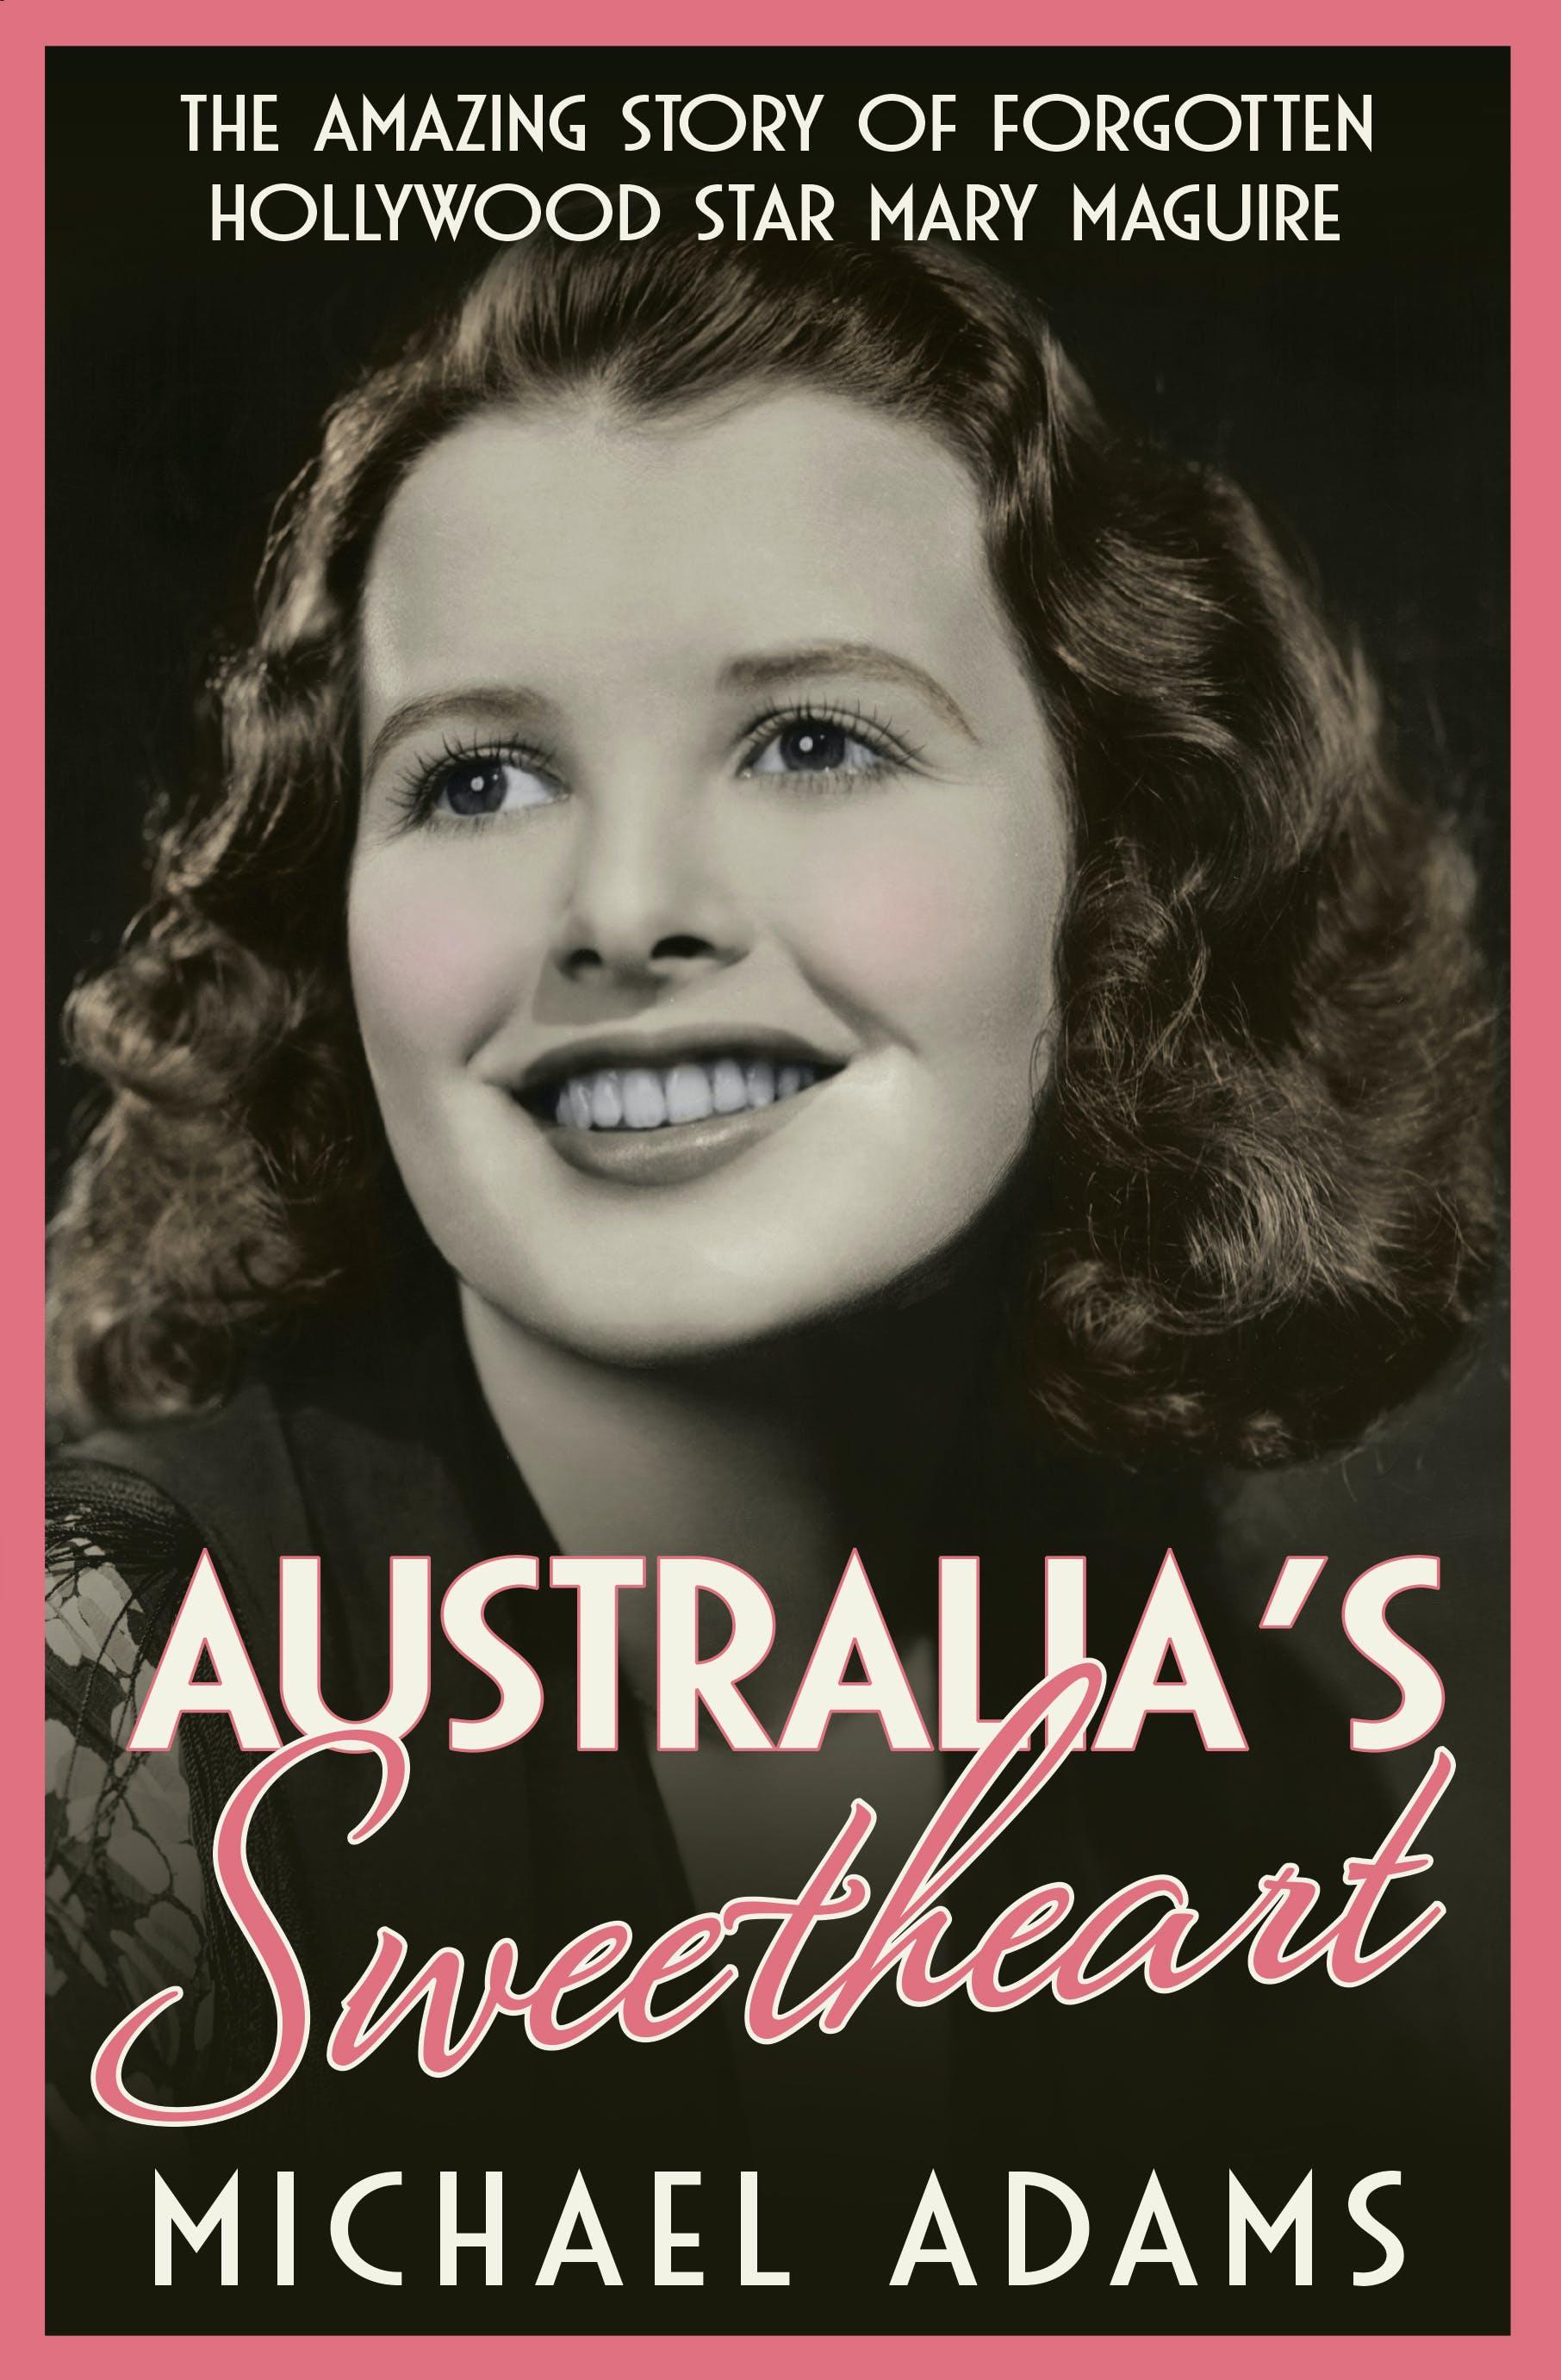 Australia's Sweetheart: The amazing story of forgotten